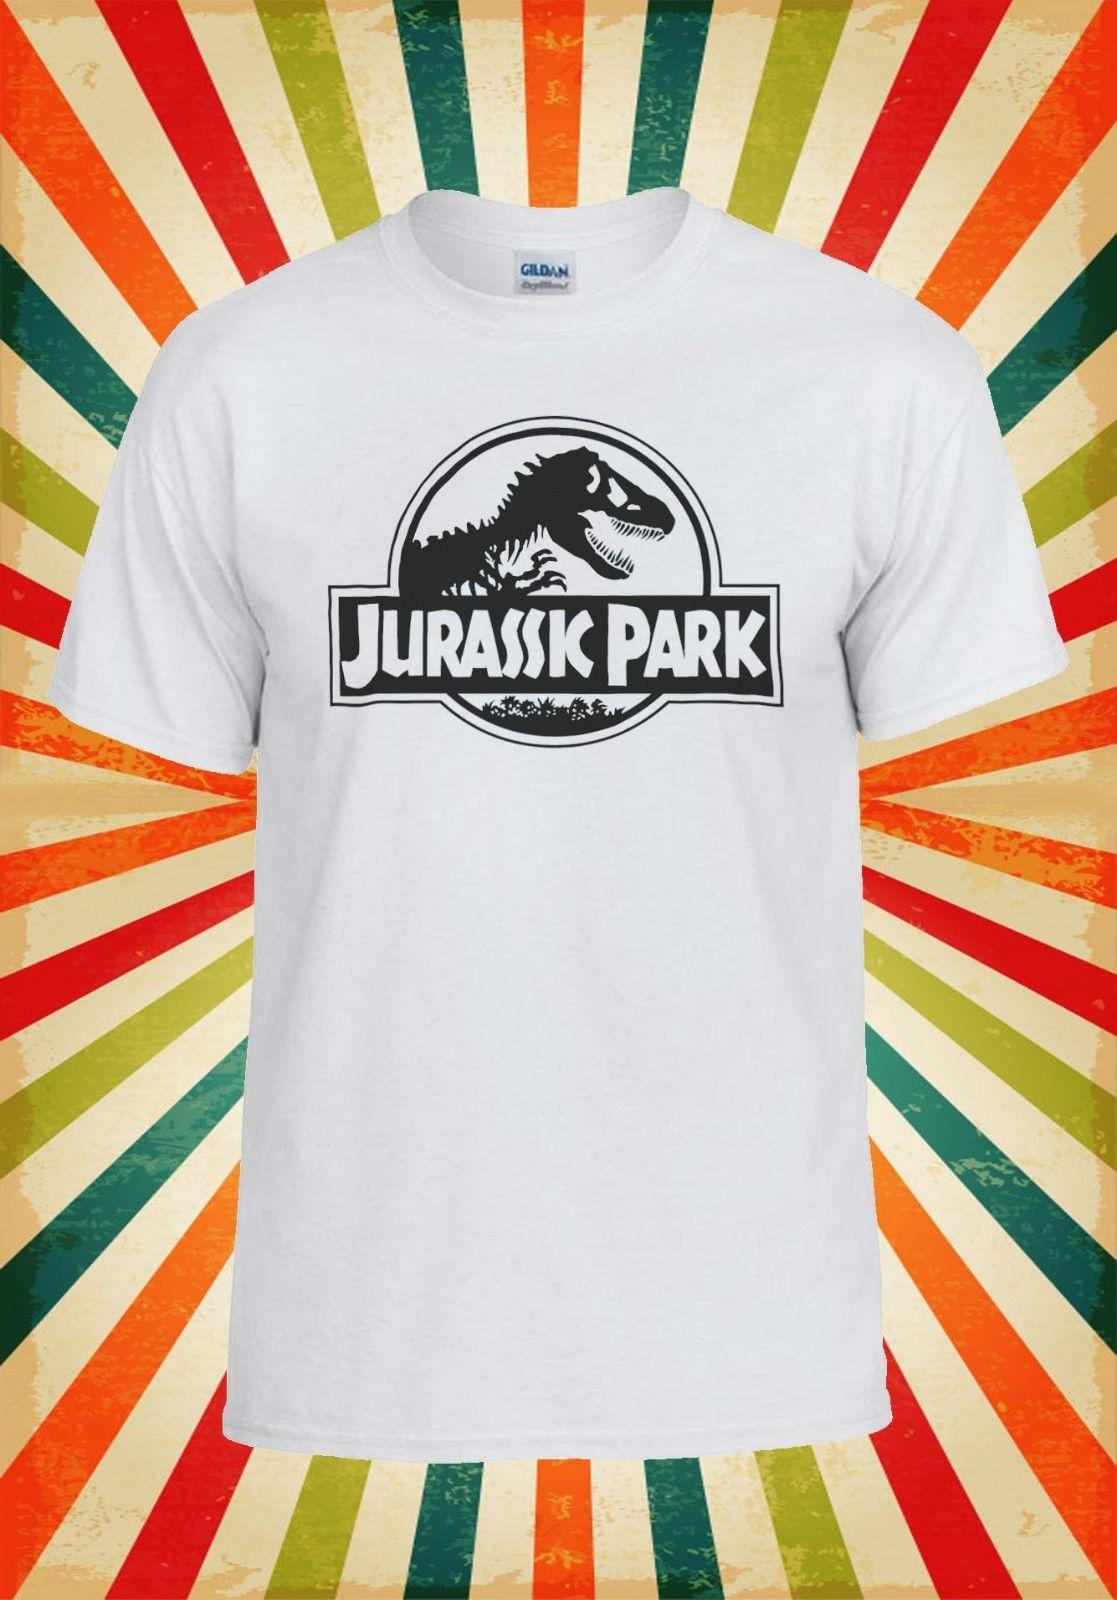 Jurassic Park World Dinosaurs Cool Men Women Vest Tank Top Unisex T Shirt  2092 Online with  13.66 Piece on Cheaptshirts48 s Store  50c724404